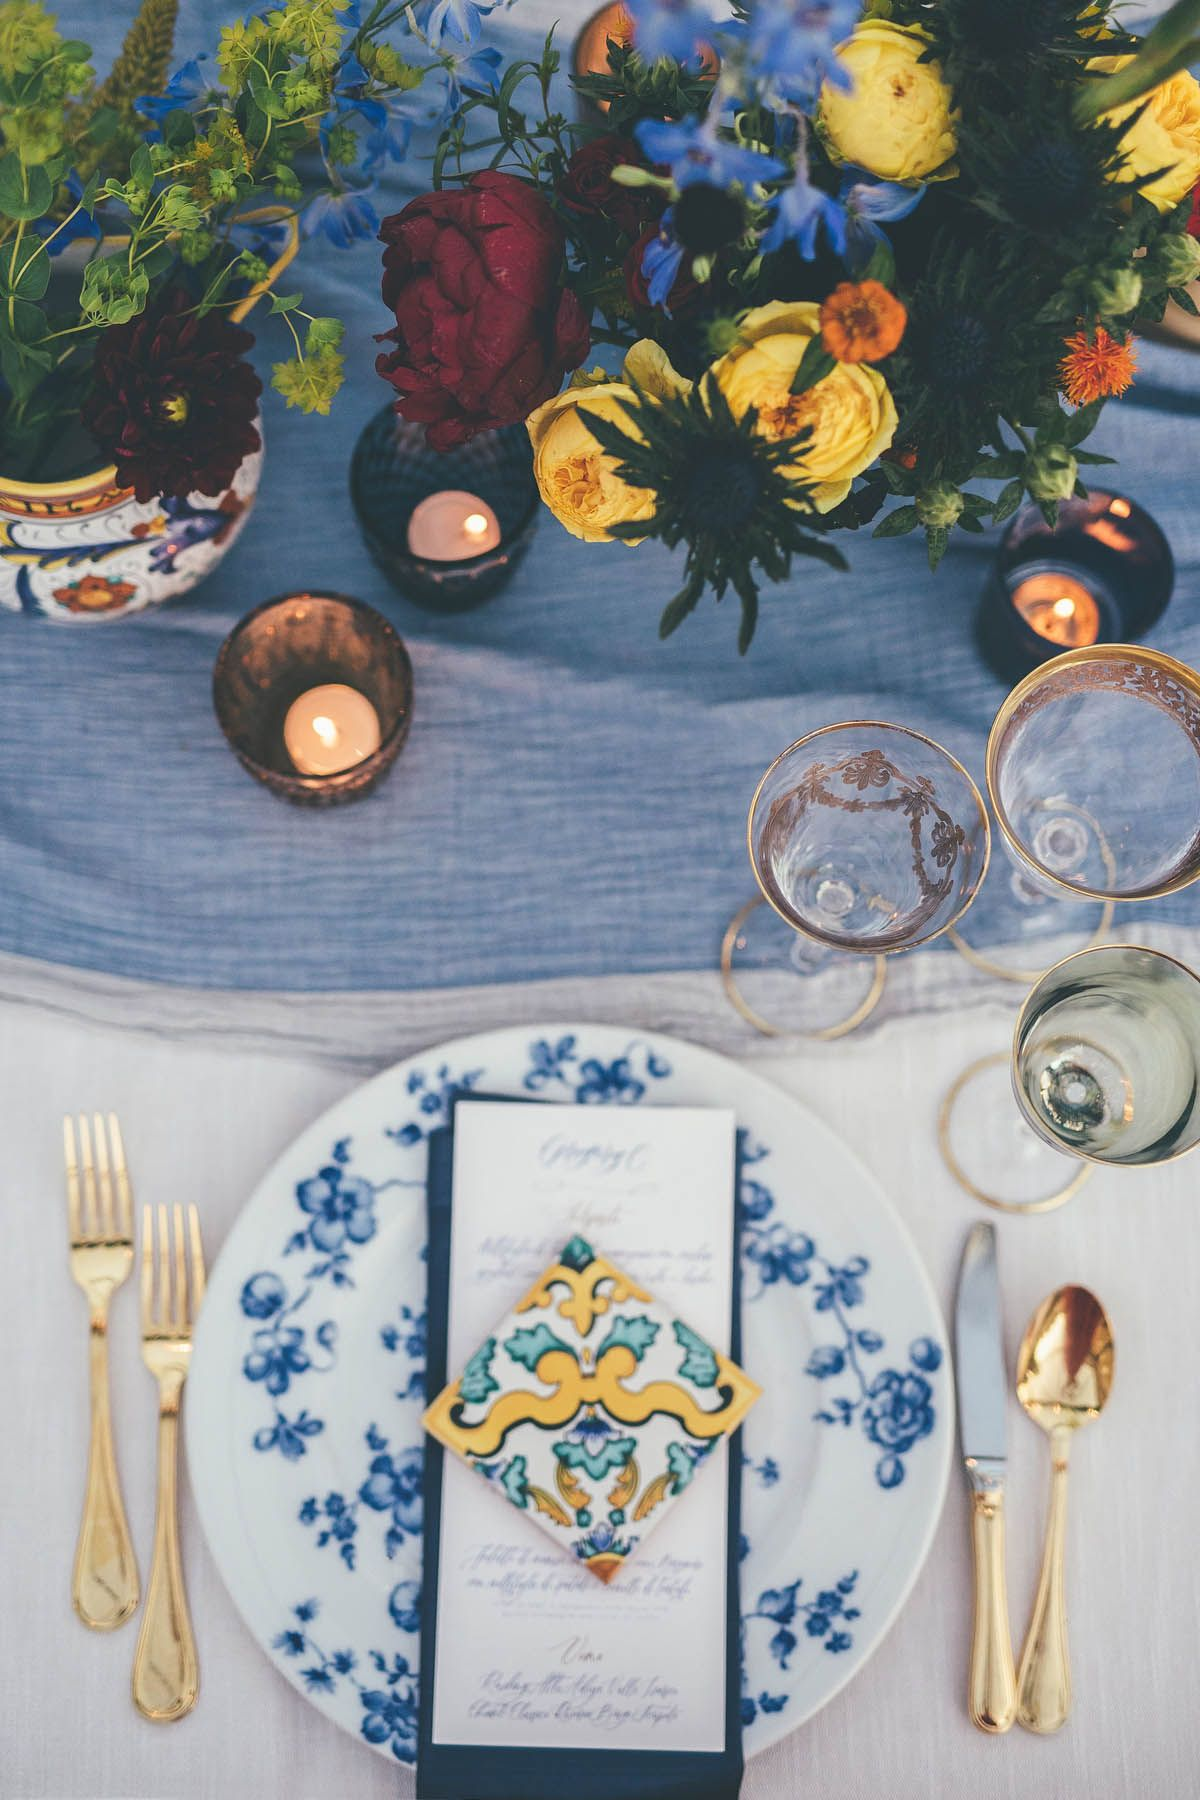 Matrimonio Tema Toscana : Pin by vesi on tuscany inspiration in matrimonio idee per